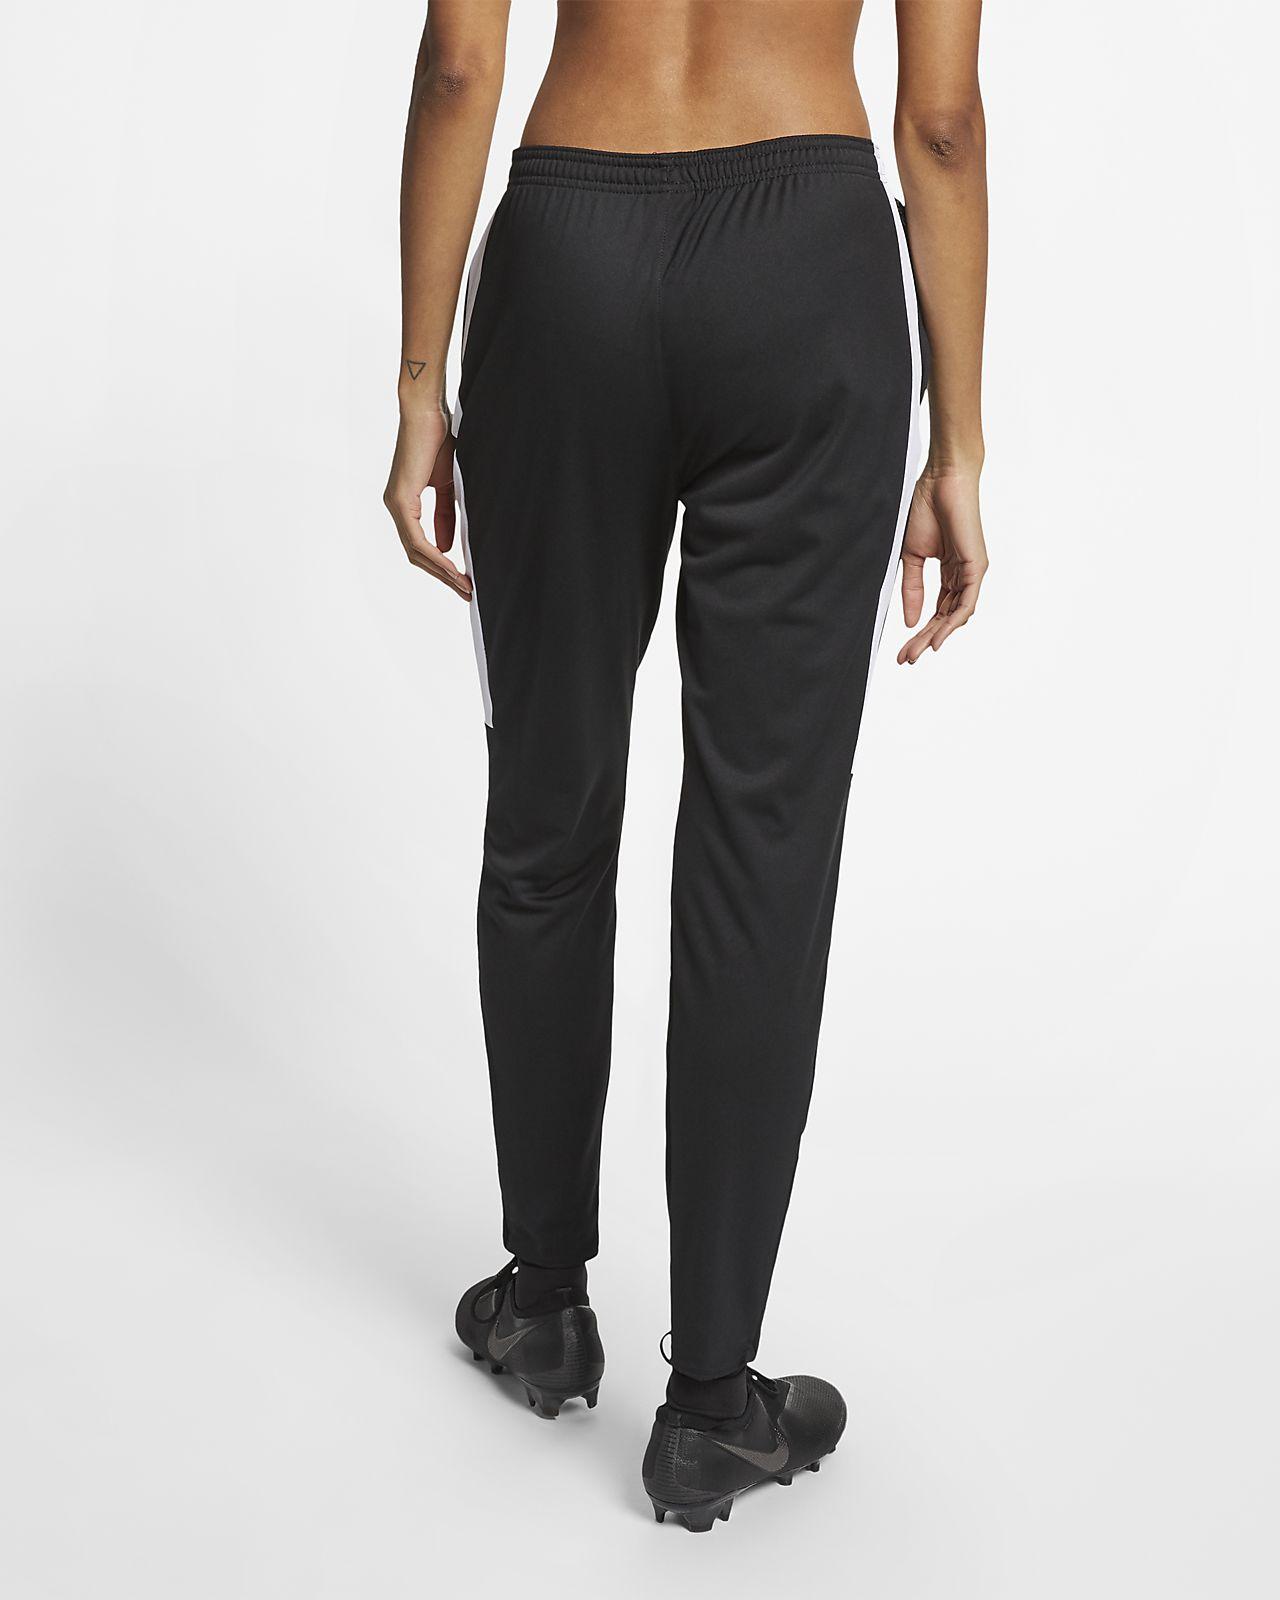 Nike Damen Academy Dri Fit Knit Fußball Hose, Damen